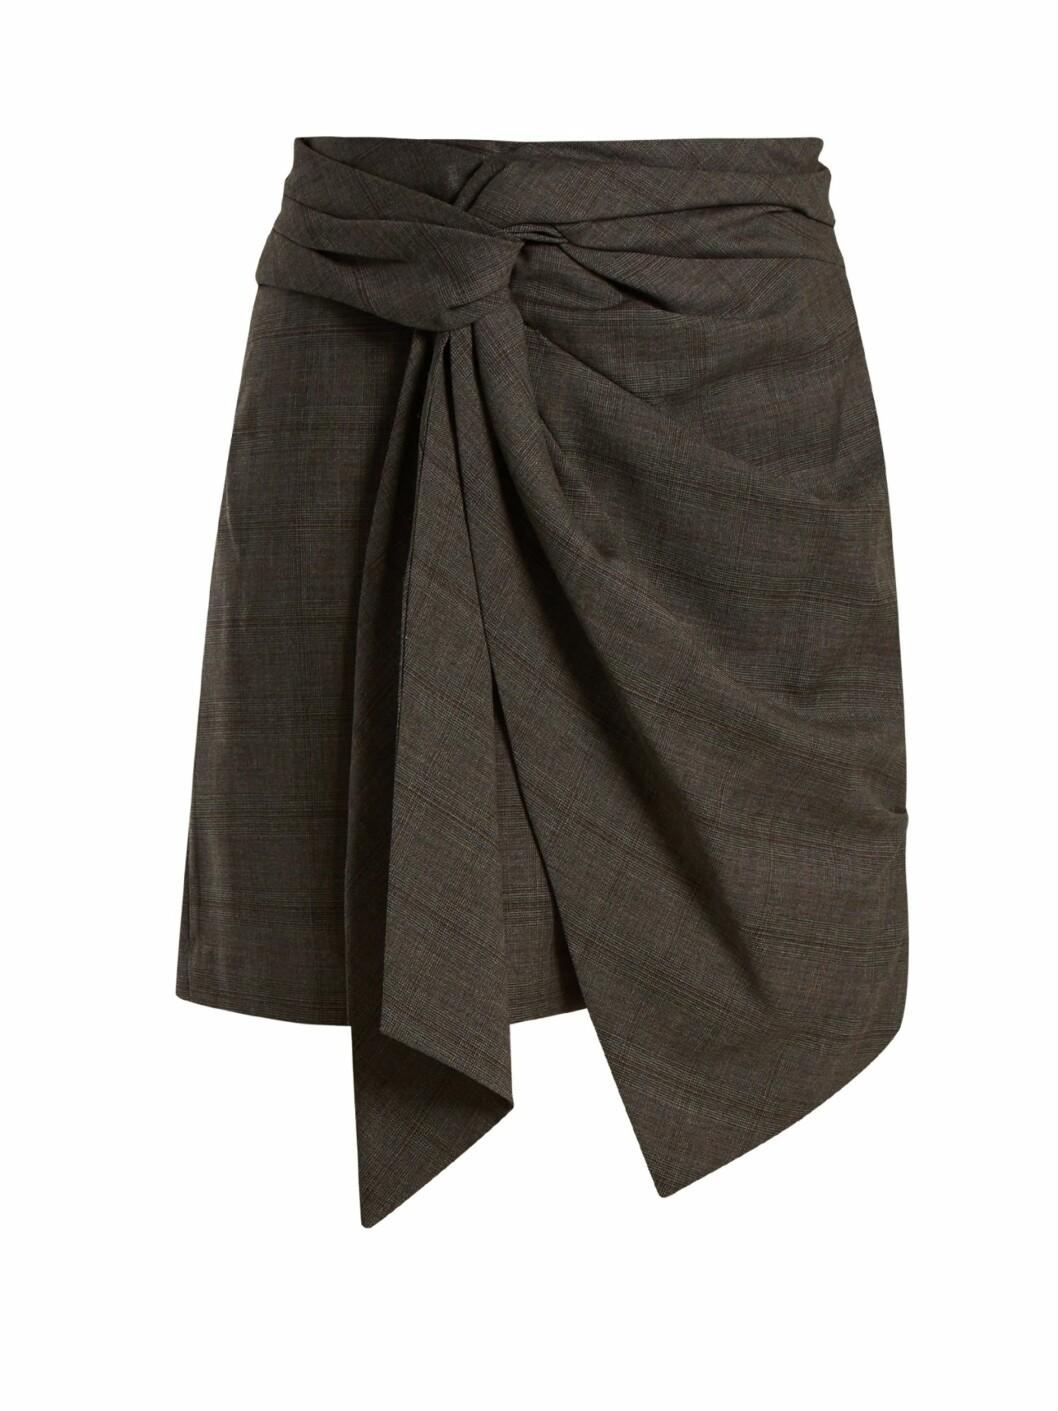 Skjørt fra Isabel Marant via Matchesfashion.com |1945,-| https://www.matchesfashion.com/intl/products/Isabel-Marant-%C3%89toile-Nima-knot-detail-checked-wool-mini-skirt--1165332